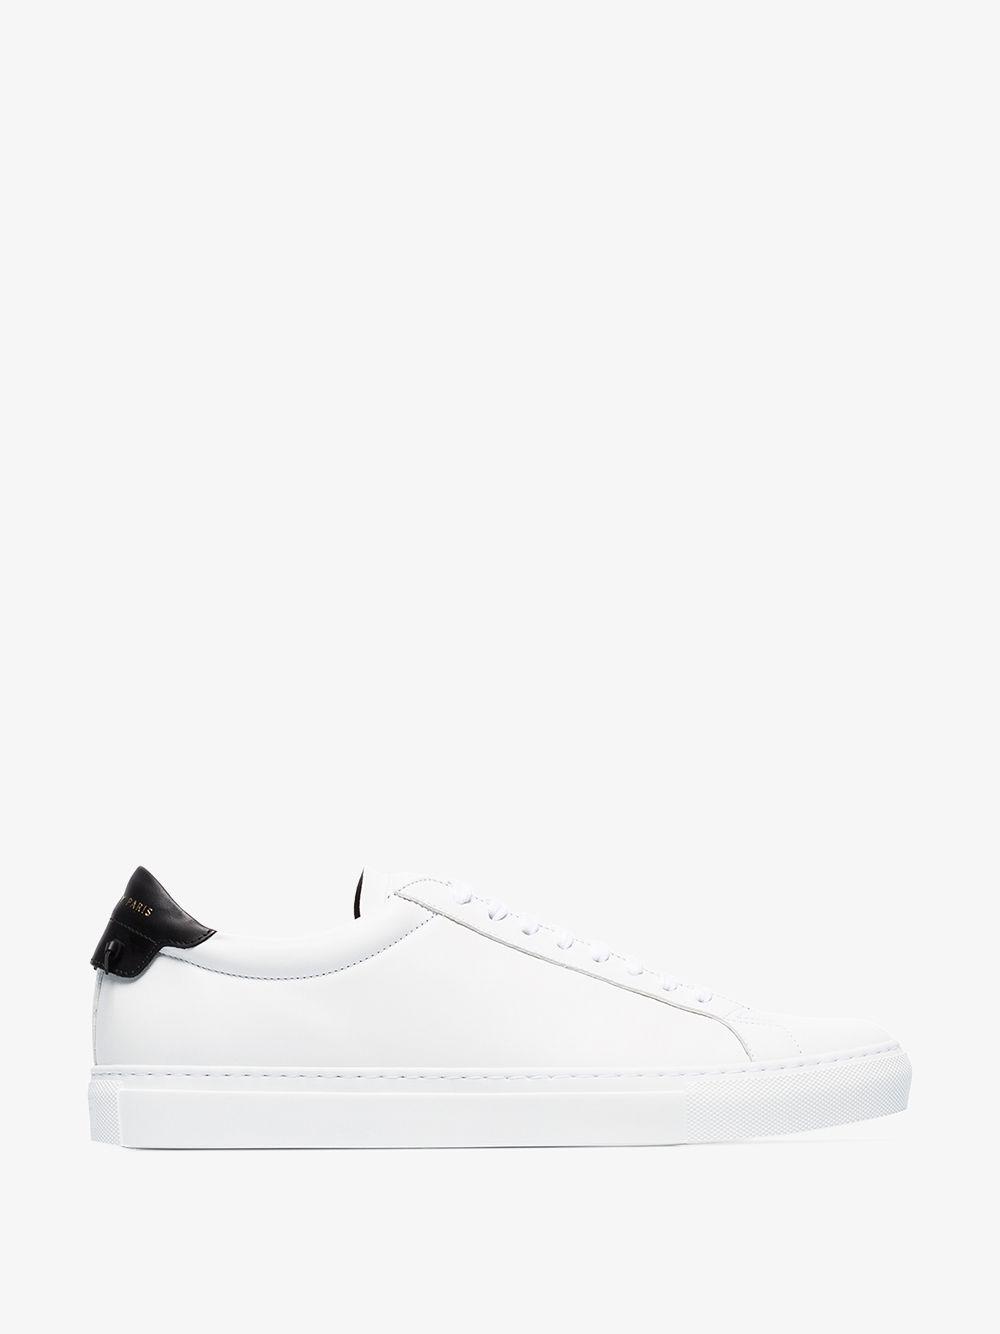 Urban Street Leather Sneakers